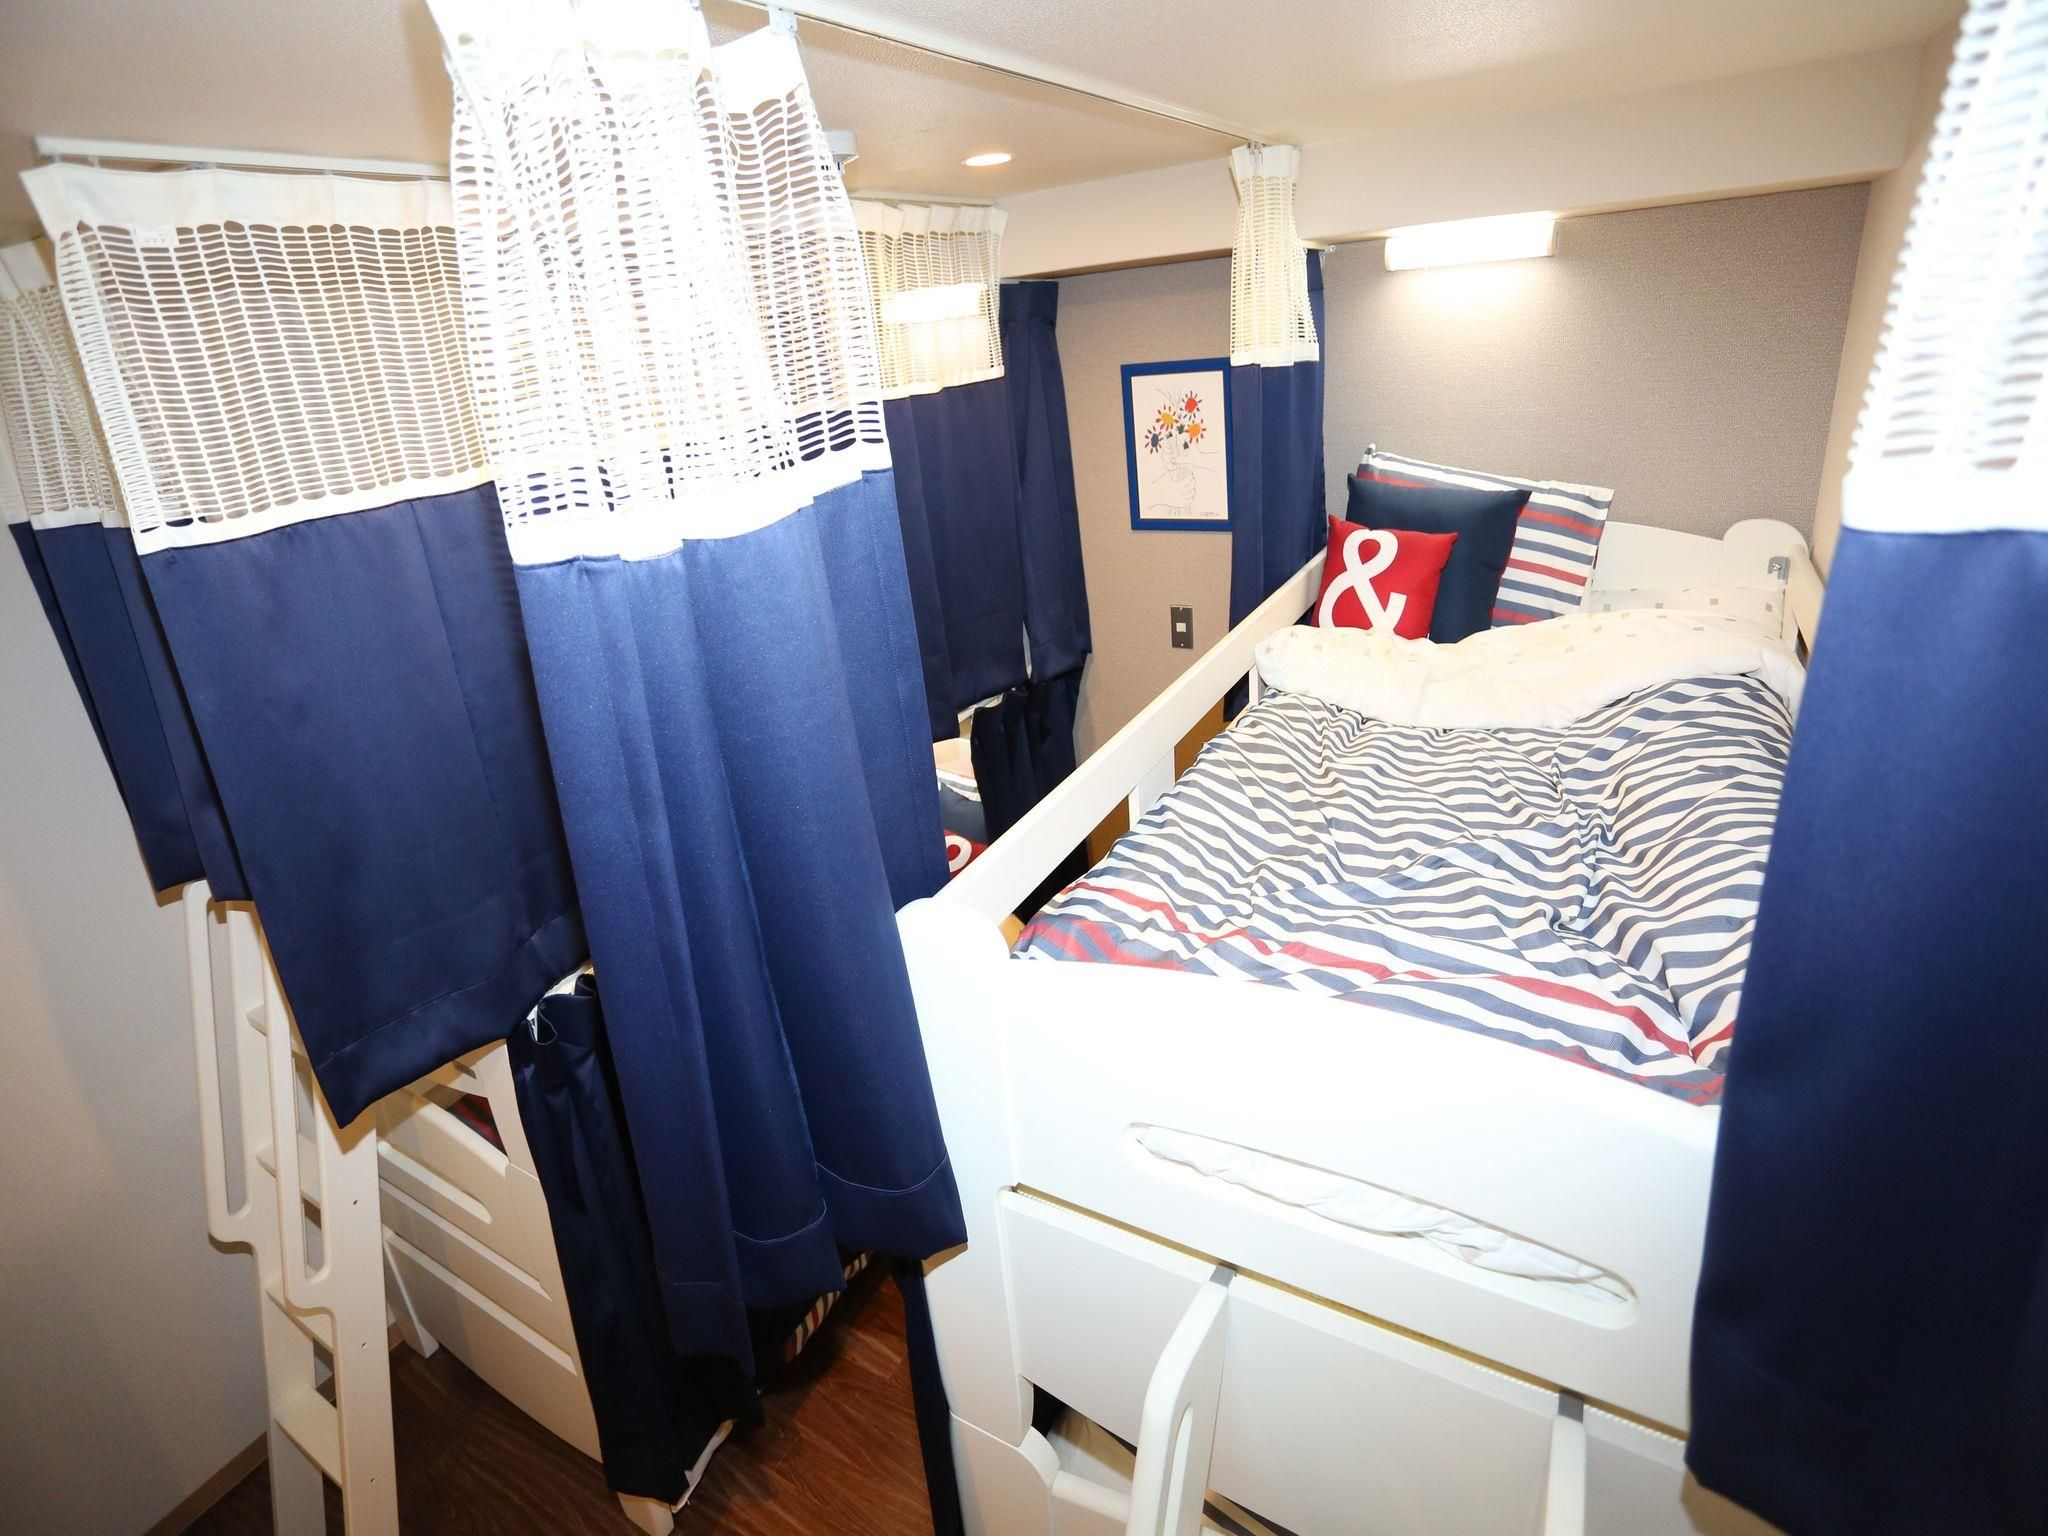 Mini loft bed with slide  BUNK BED HOSTEL GUEST HOUSE Osaka Japan  Asia  Pinterest  Beds